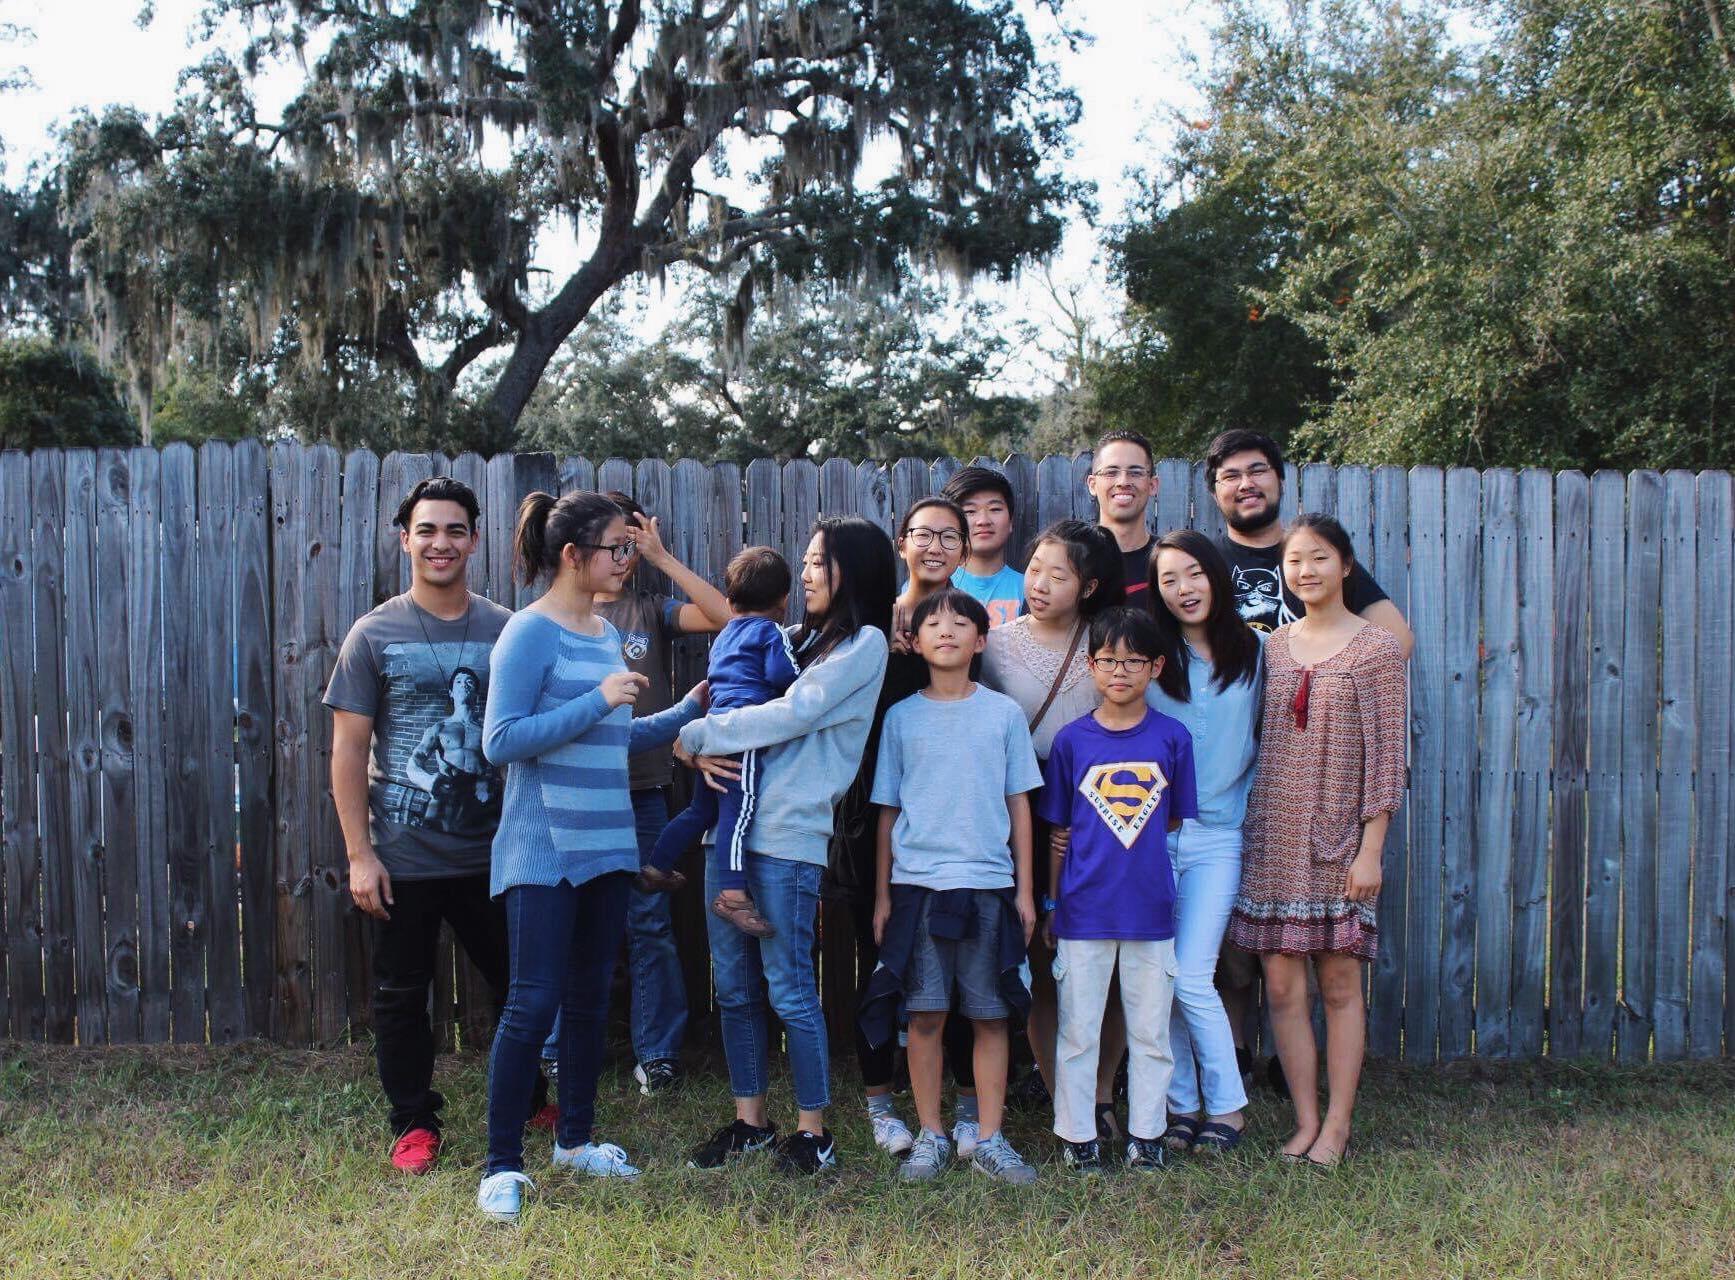 2017 Group Photo